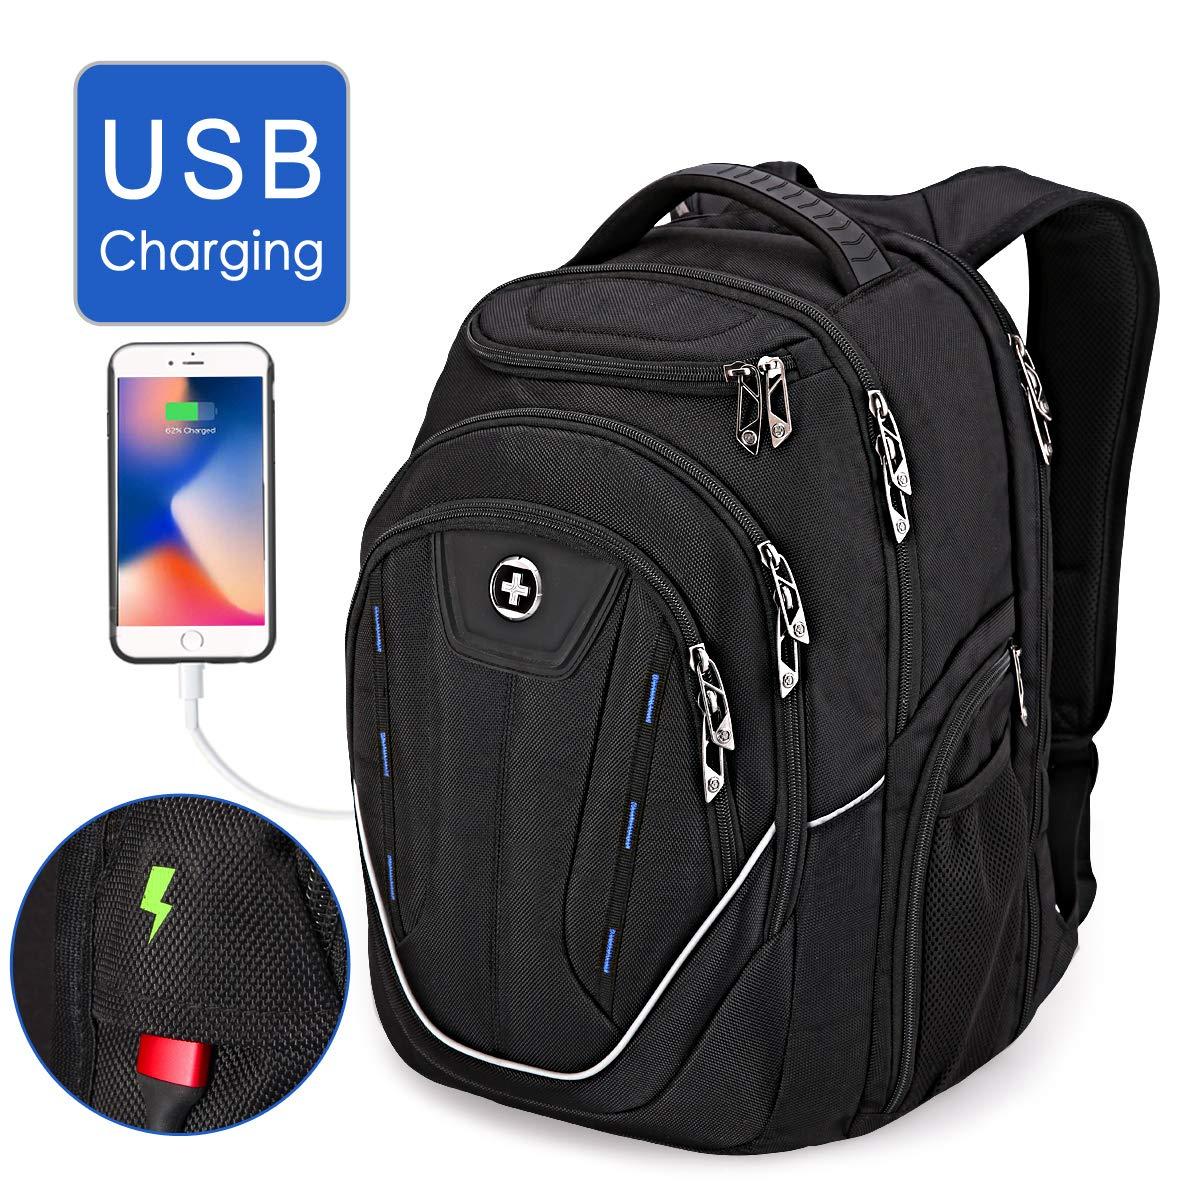 TSA Friendly, Swissdigital Water-Resistant Large Backpack, Business Laptop Backpack for Men with USB Charging Port/RFID Protection Big School Bookbag Fits 15.6 in Travel Laptop Backpack [Black] (B) by Swissdigital